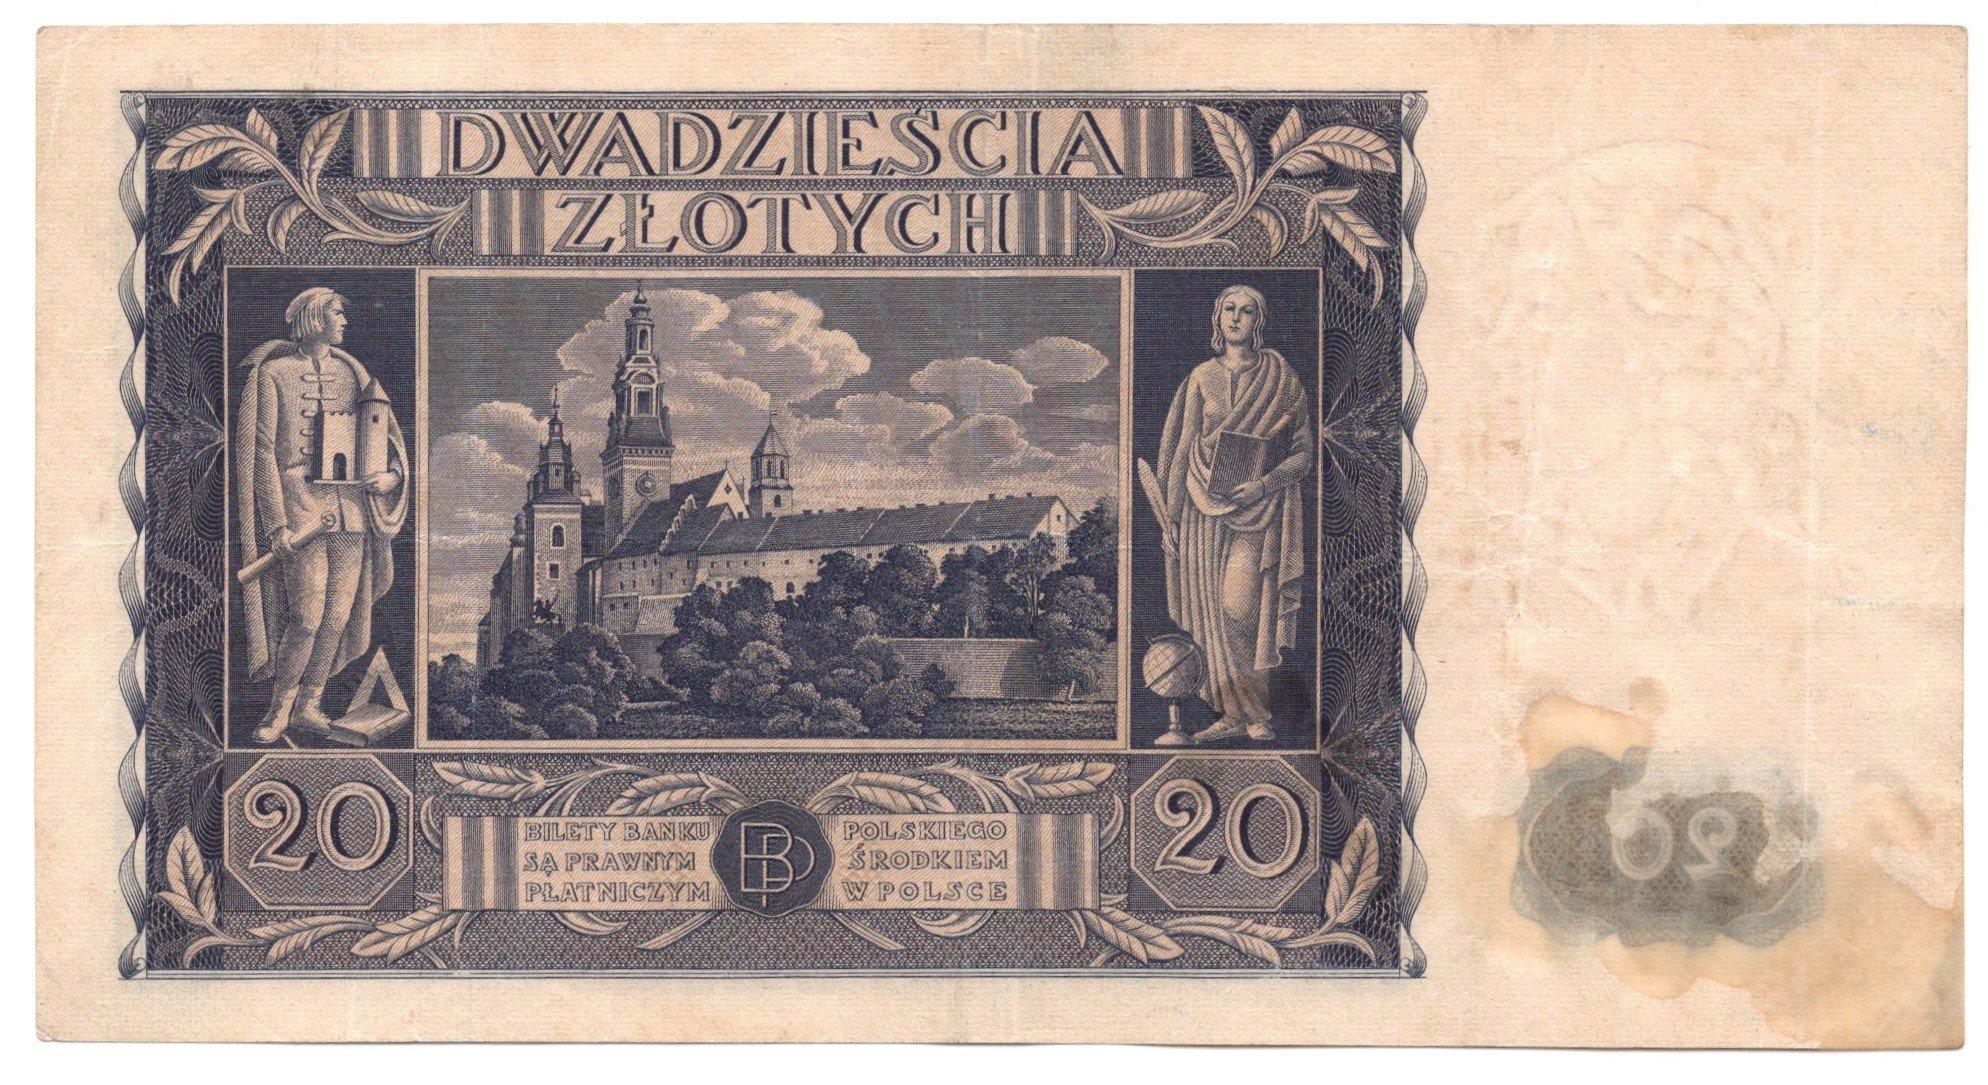 Poland 20 zlotych 1936 for sale